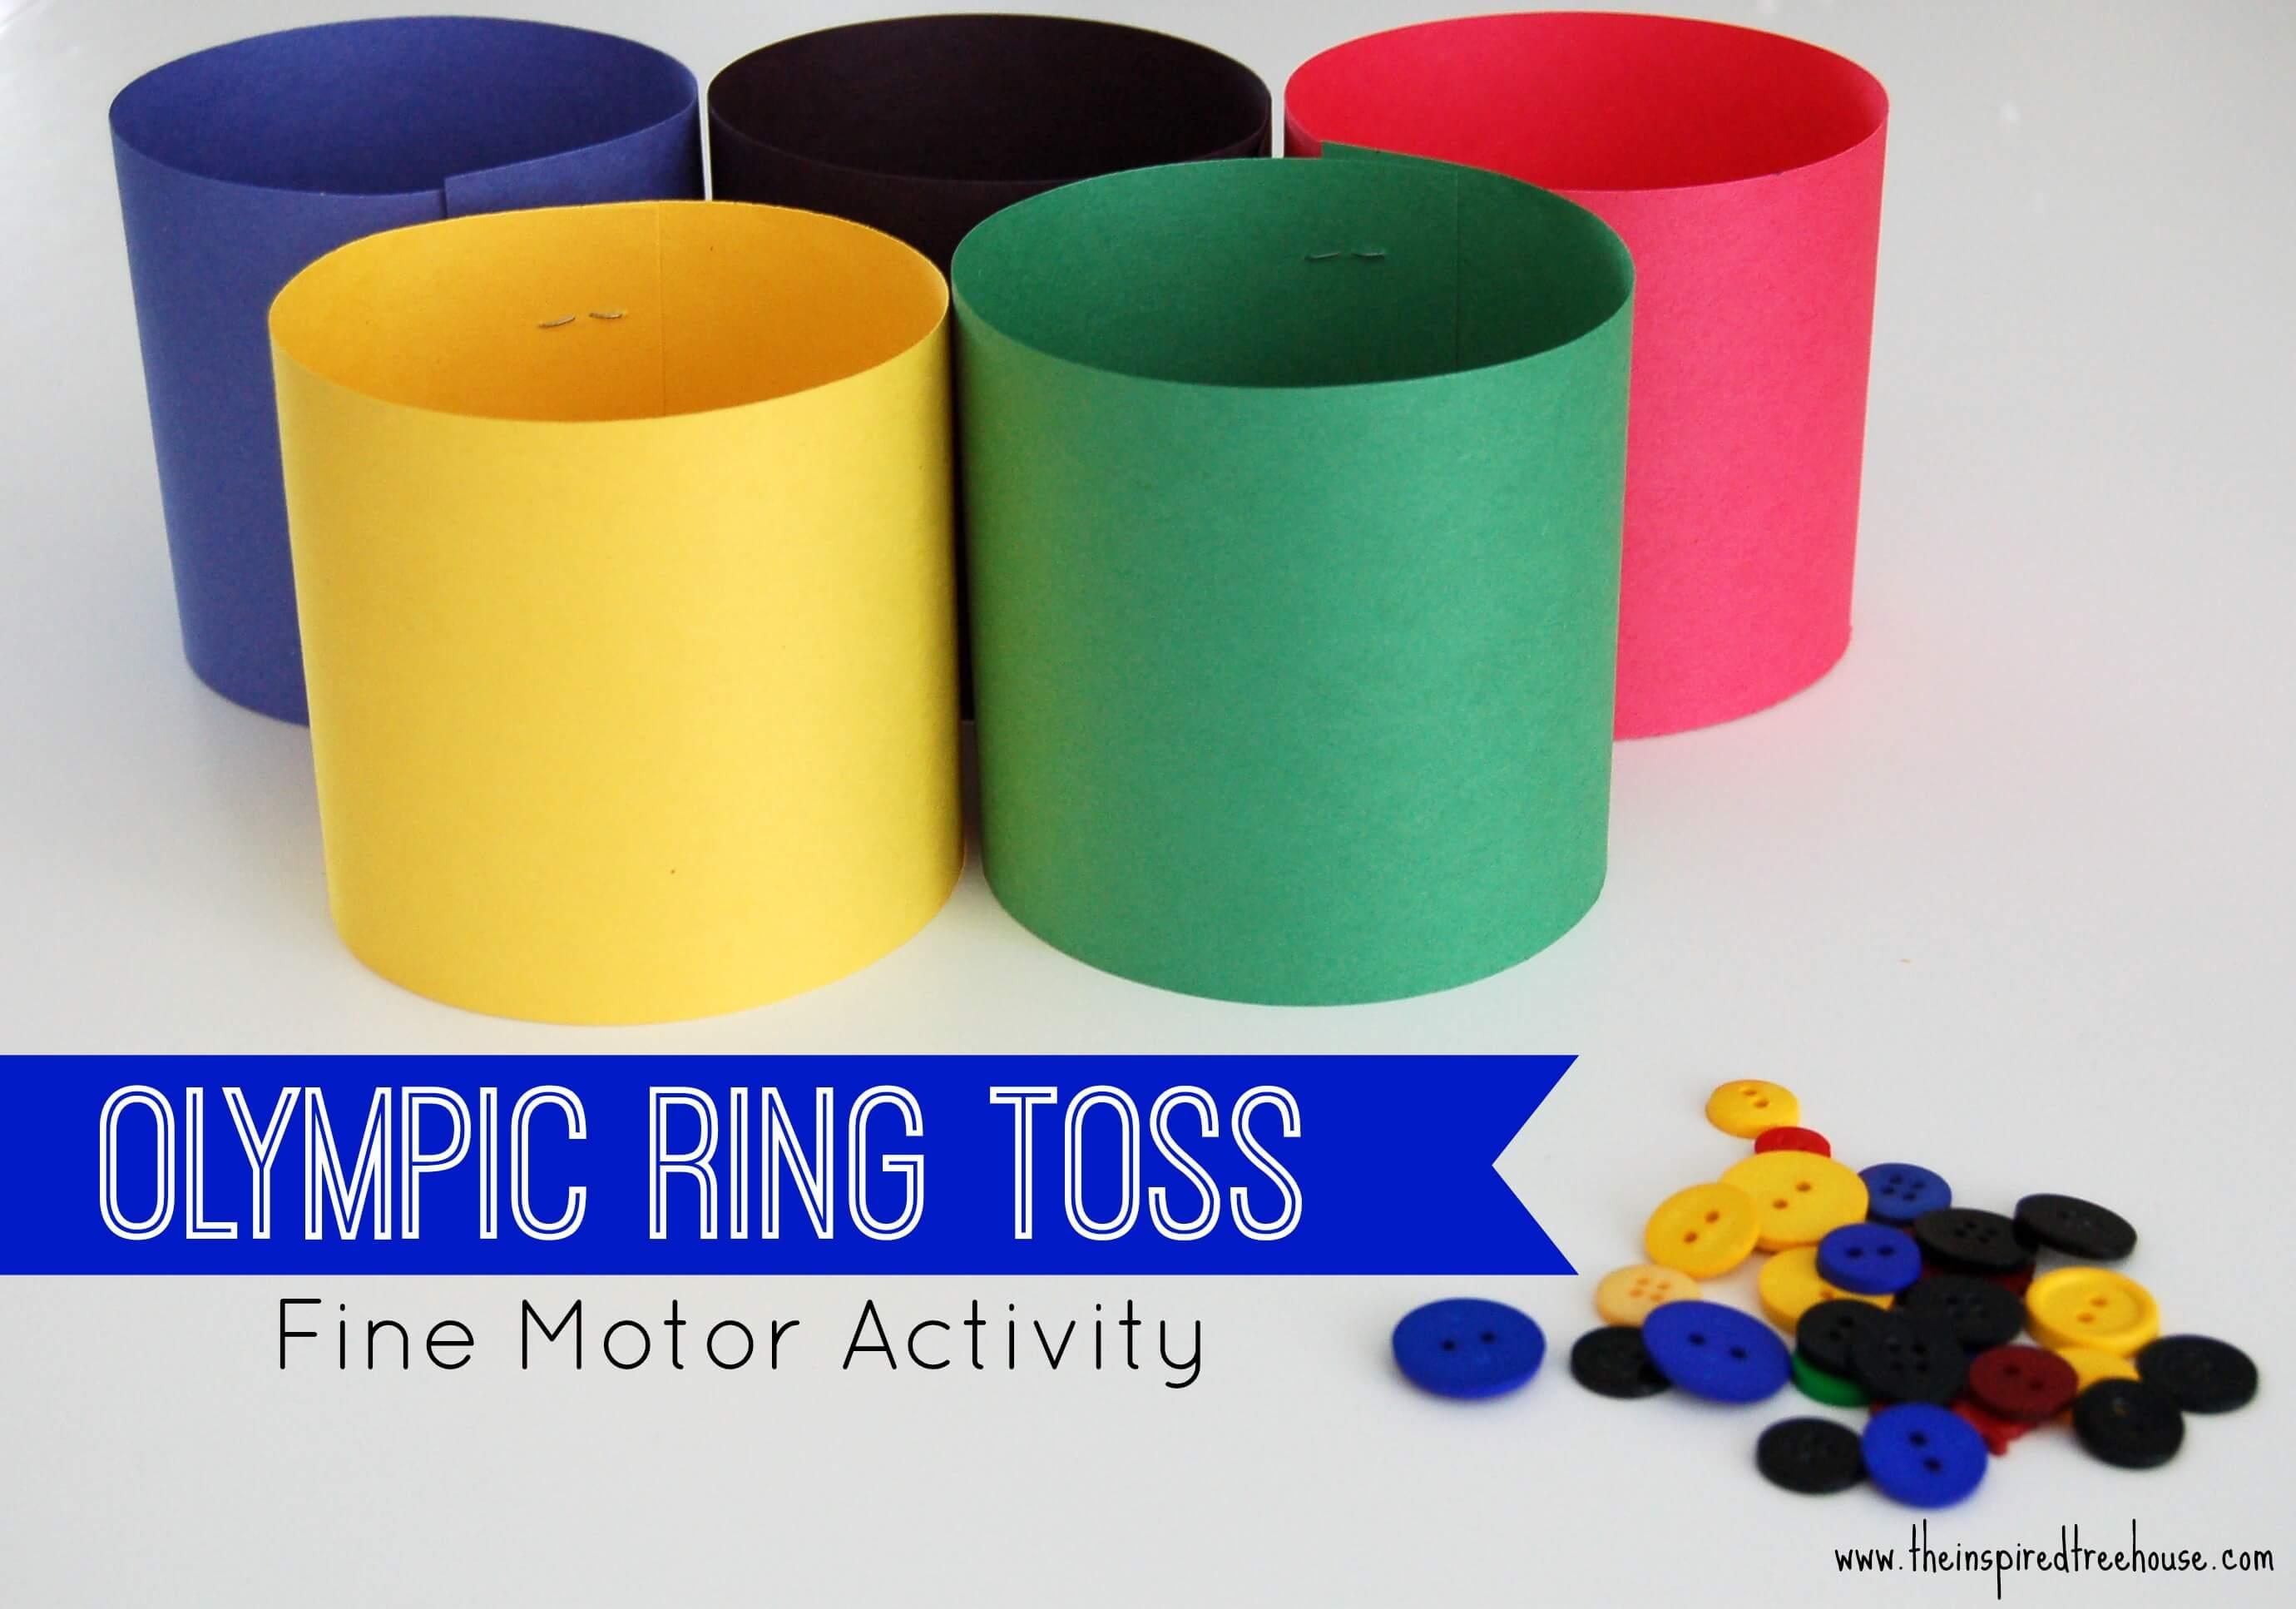 OLYMPIC FINE MOTOR RING TOSS GAME FOR KIDS